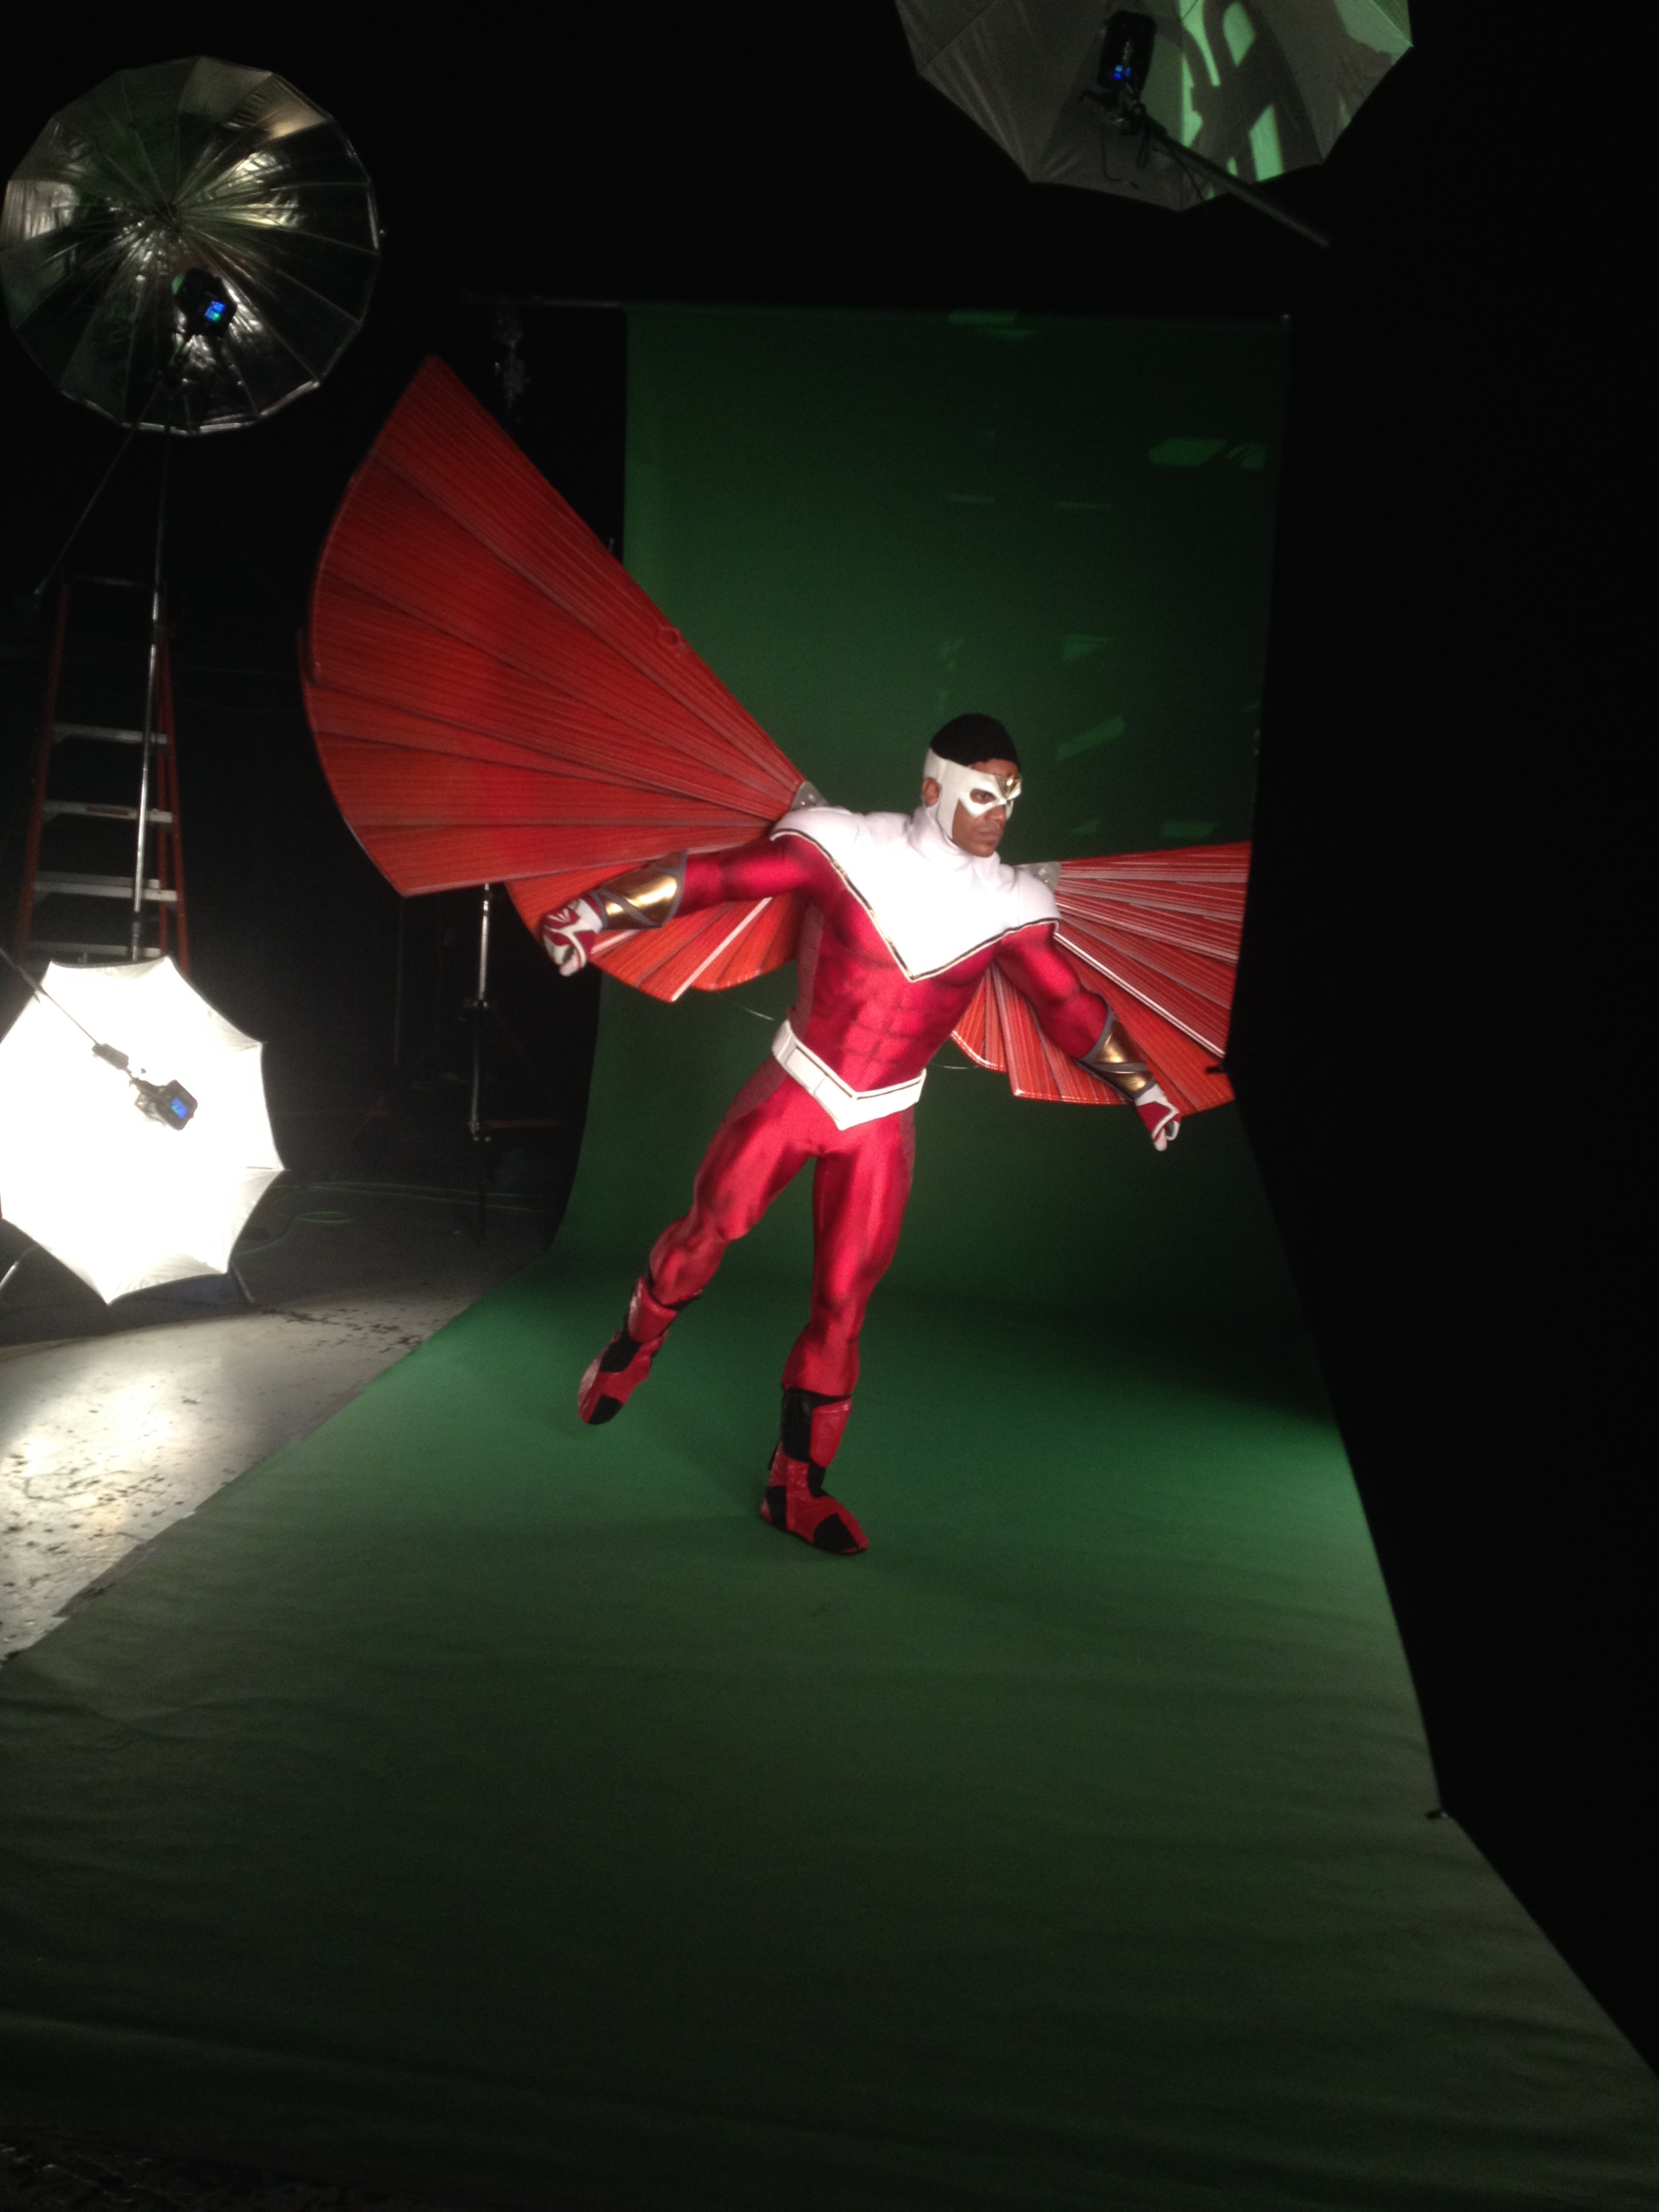 marvelLiveflcon shoot.jpg